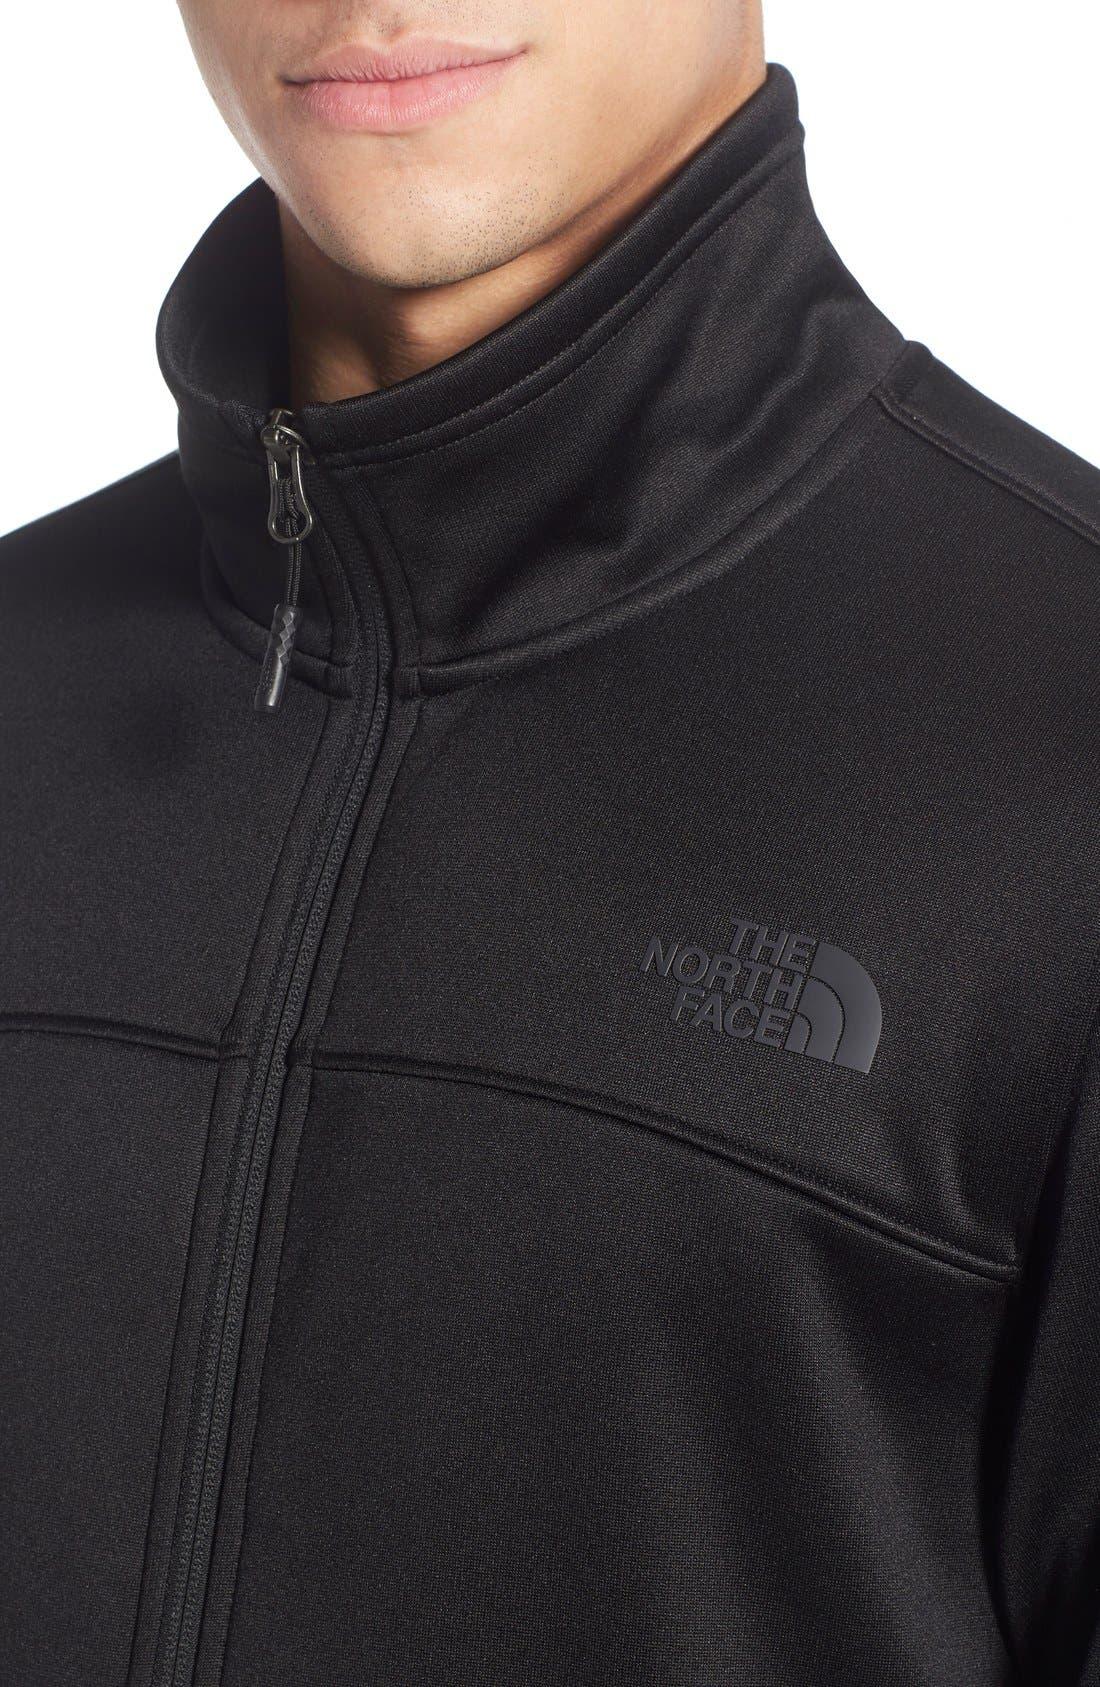 Alternate Image 4  - The North Face 'Momentum' Fleece Jacket